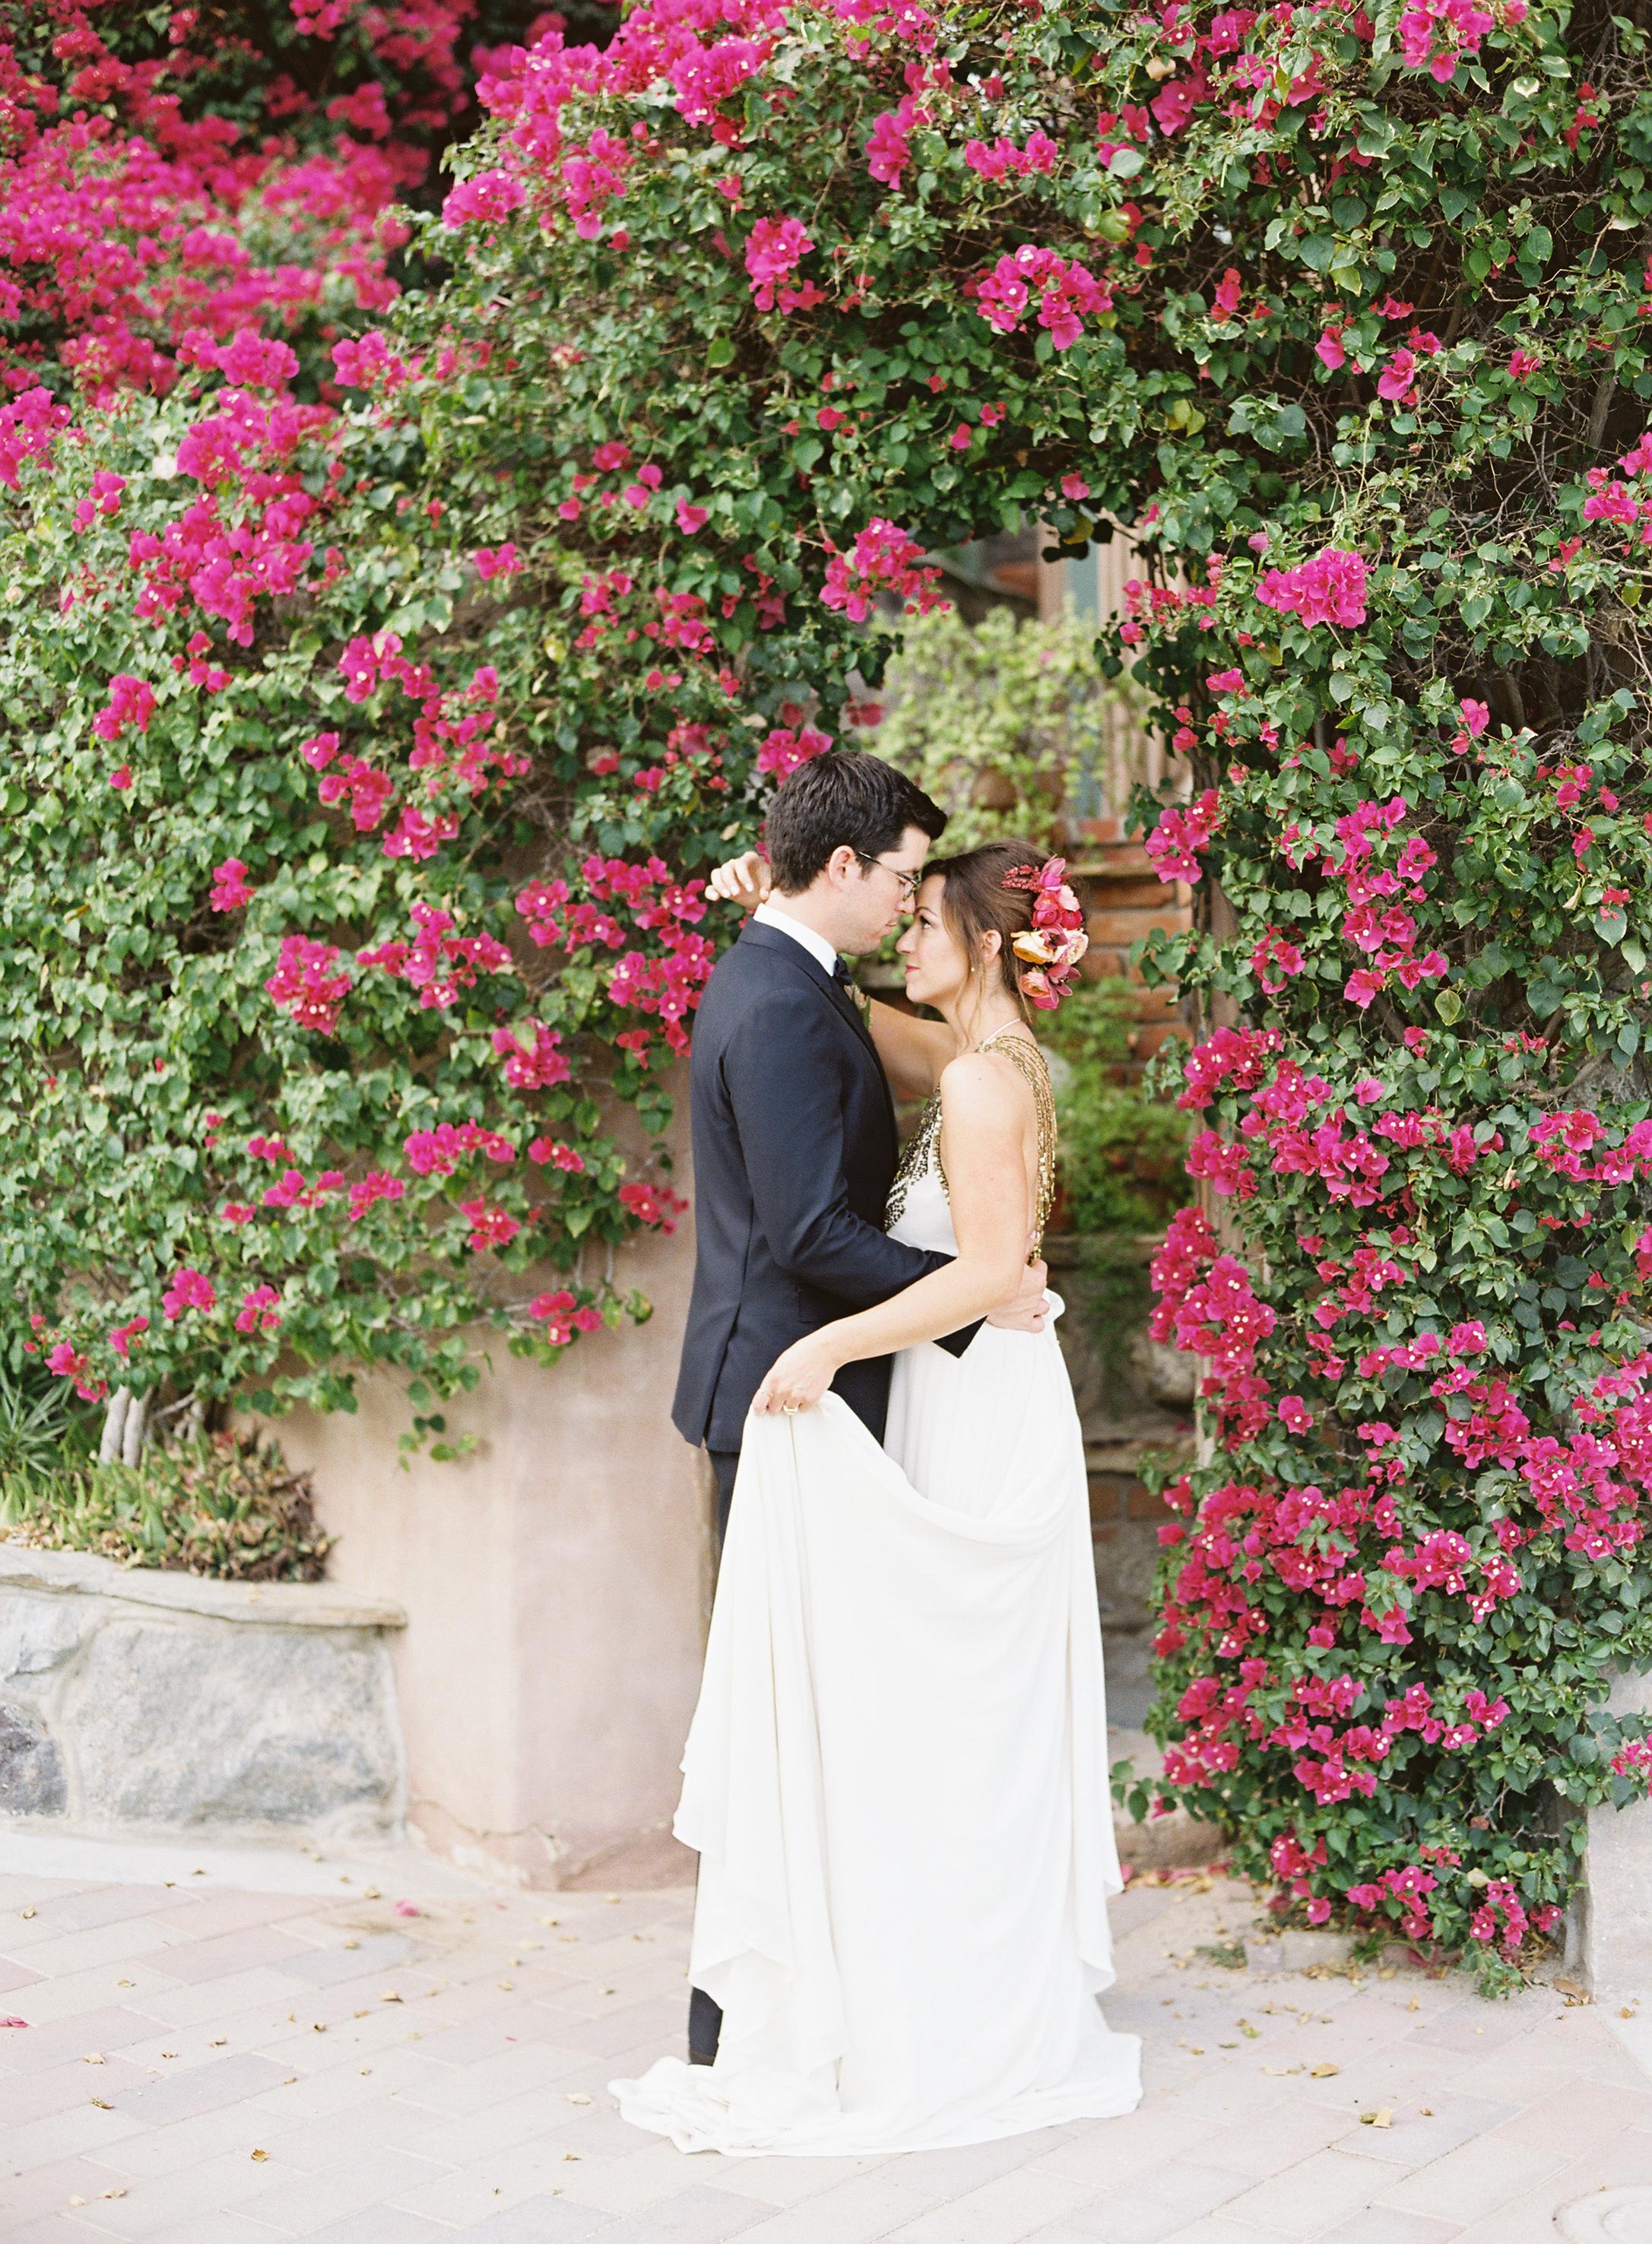 Steve & Mollie - Palm Springs